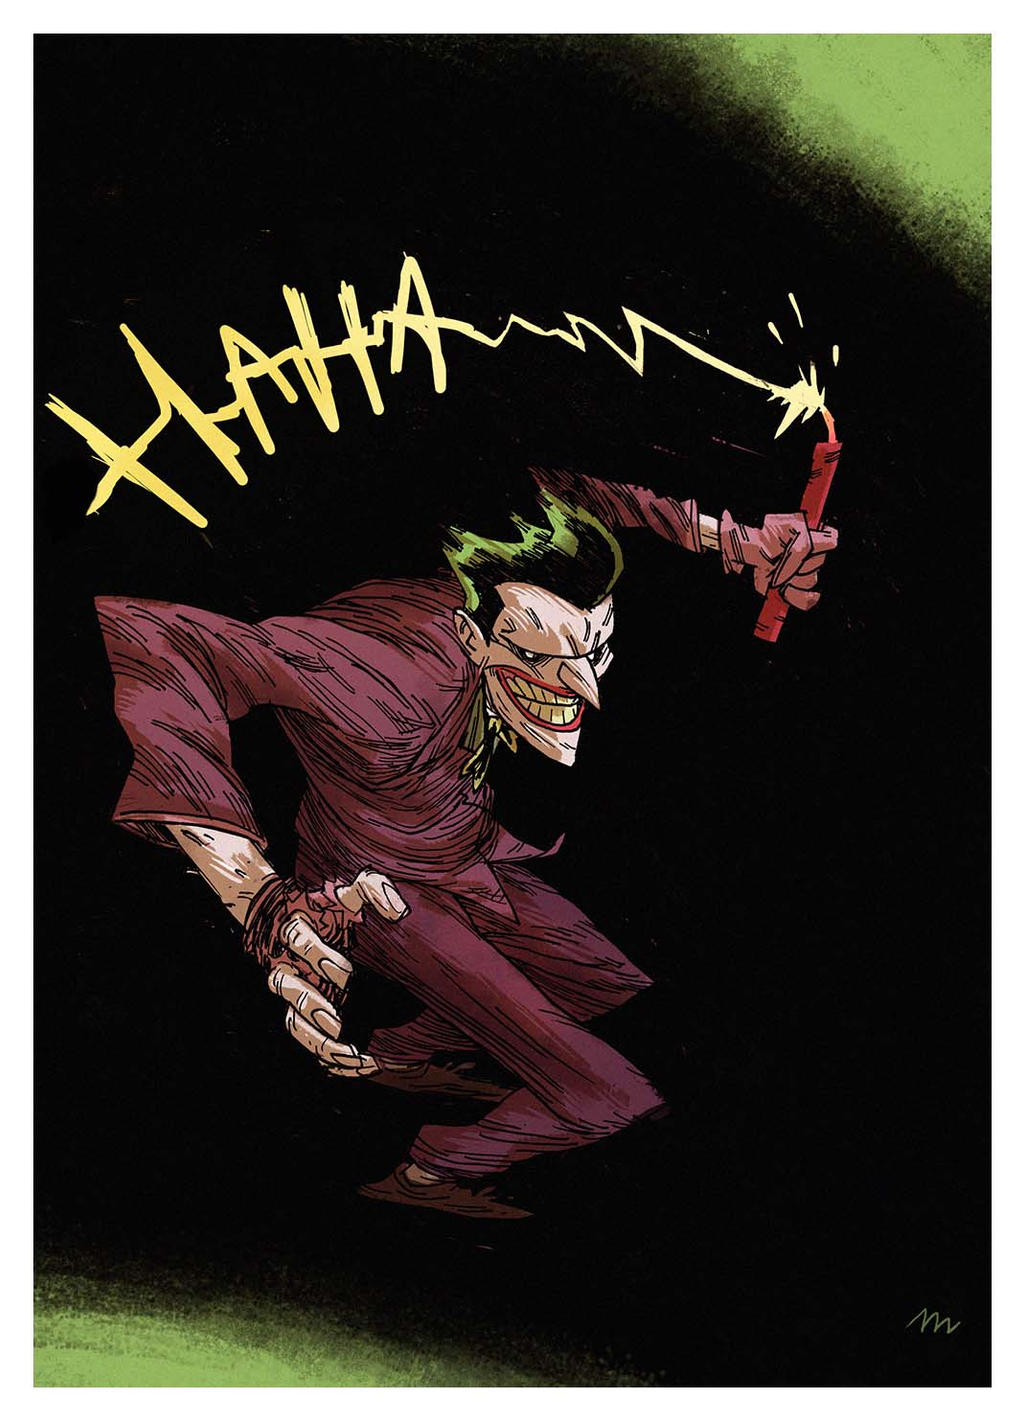 Joker commission by marklaszlo666